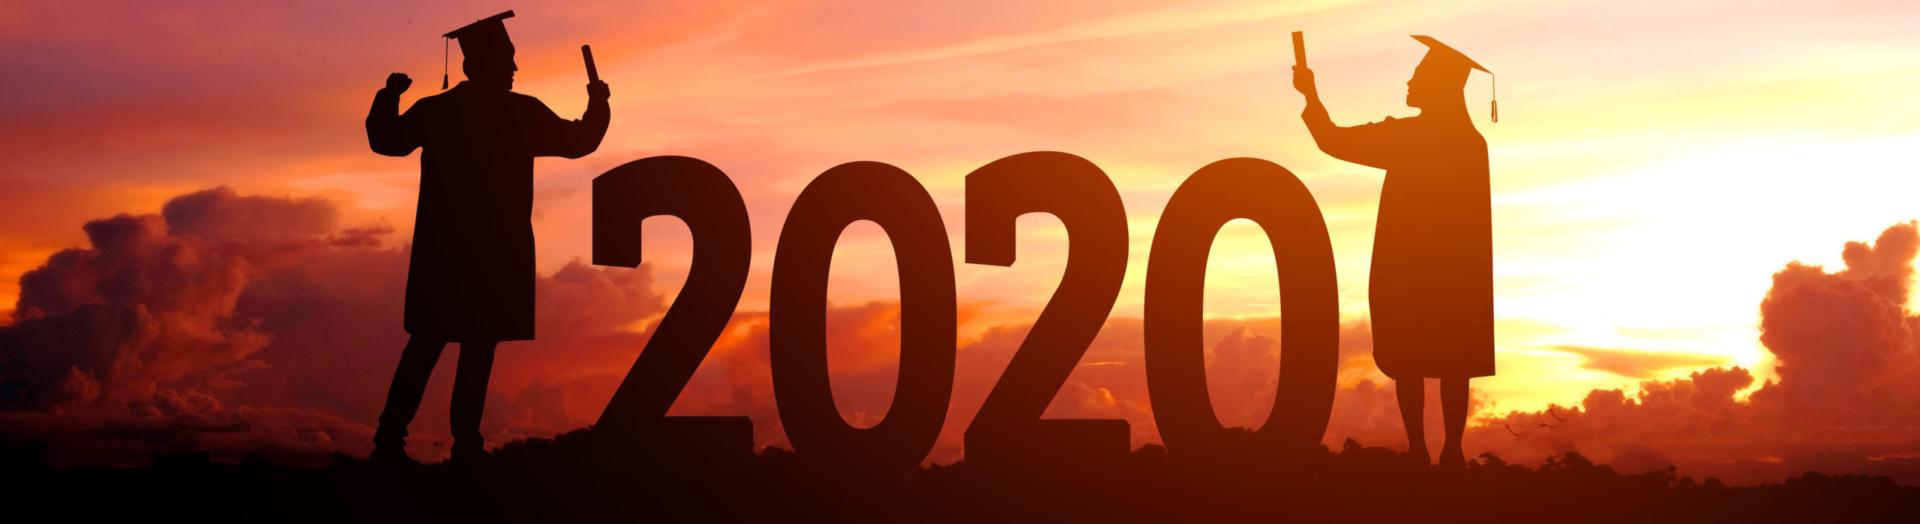 Commencement 2020 | Fairleigh Dickinson University